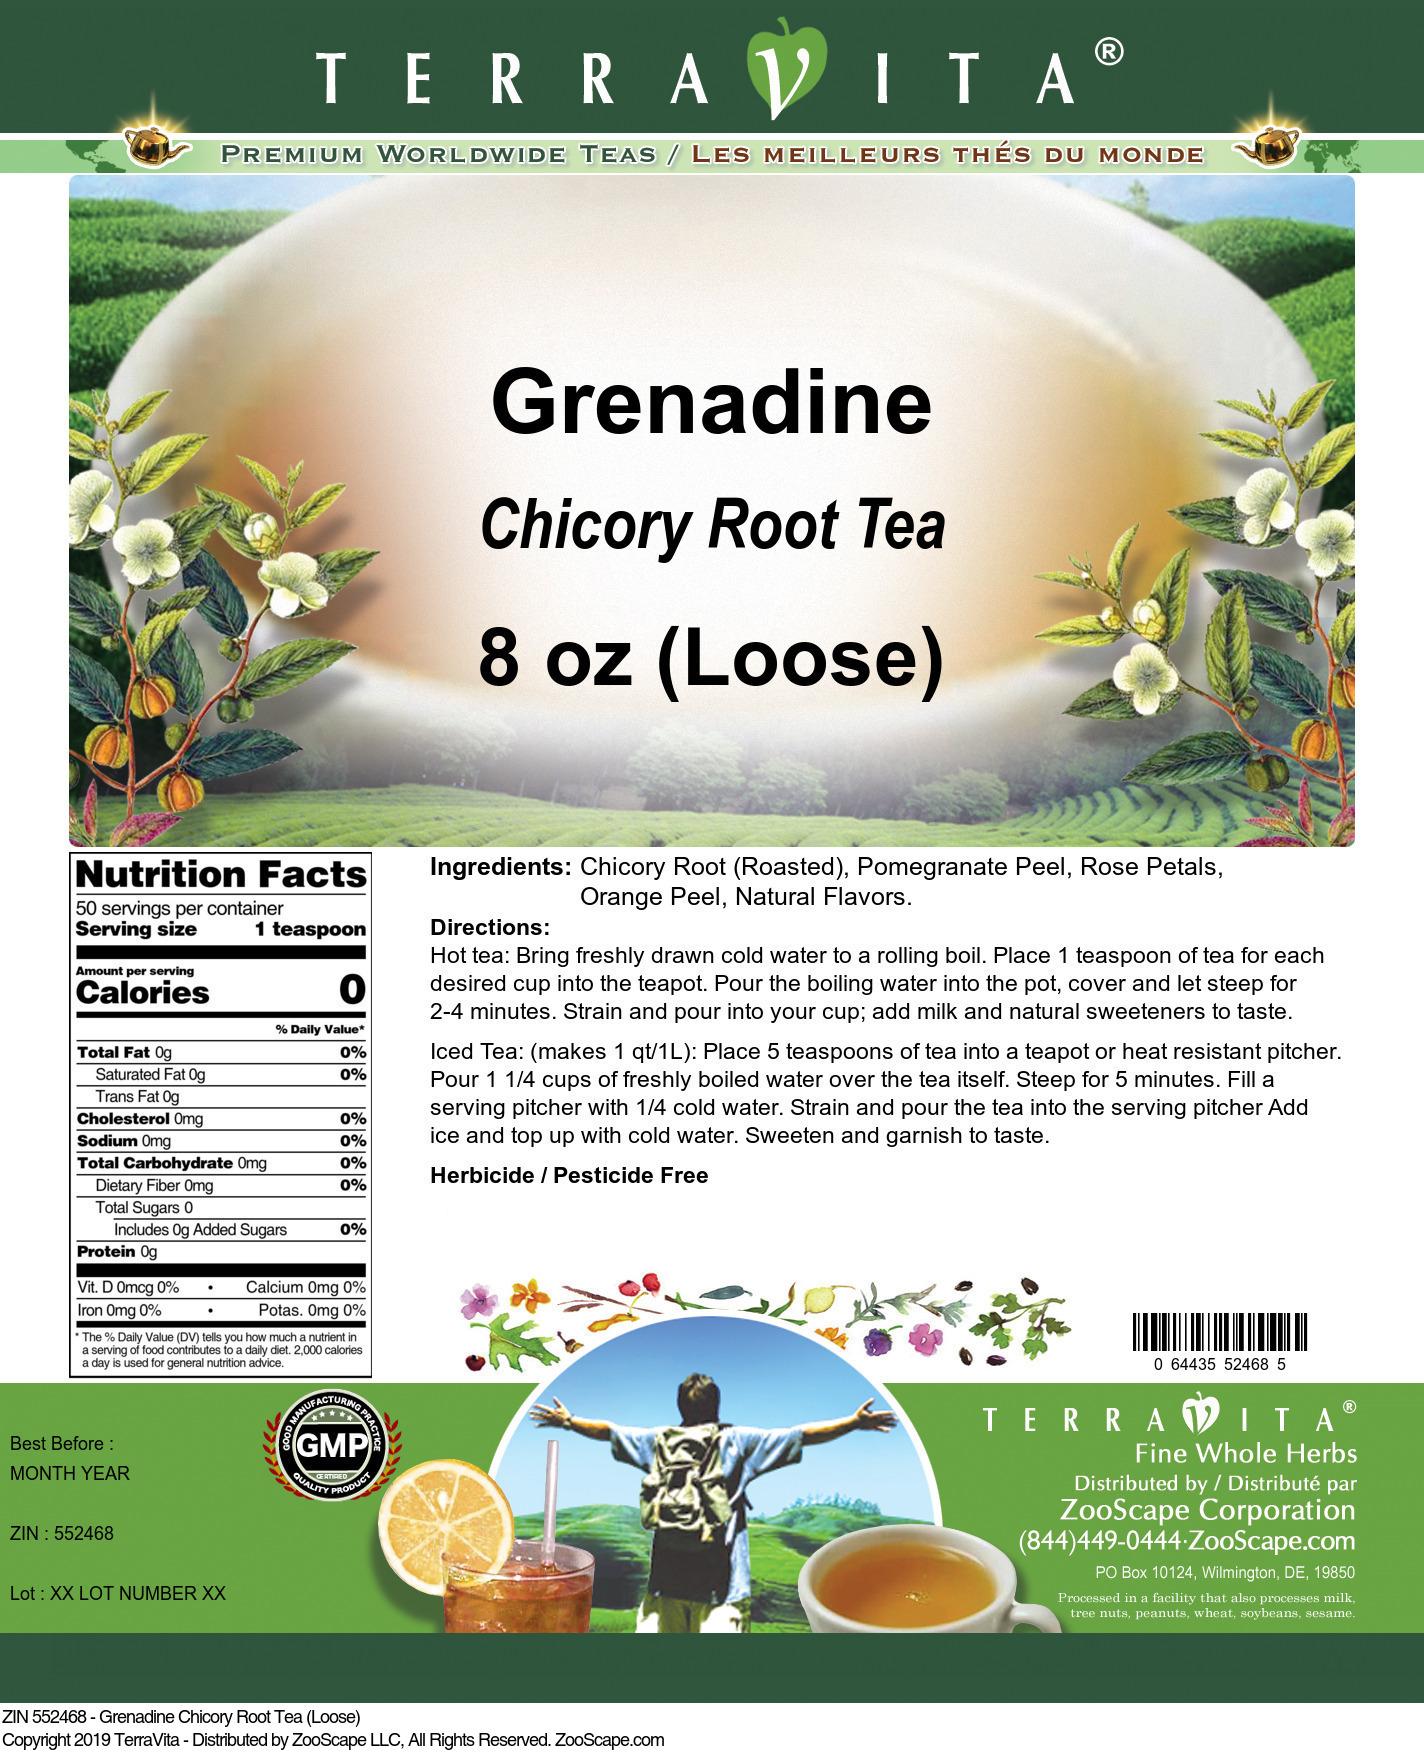 Grenadine Chicory Root Tea (Loose)